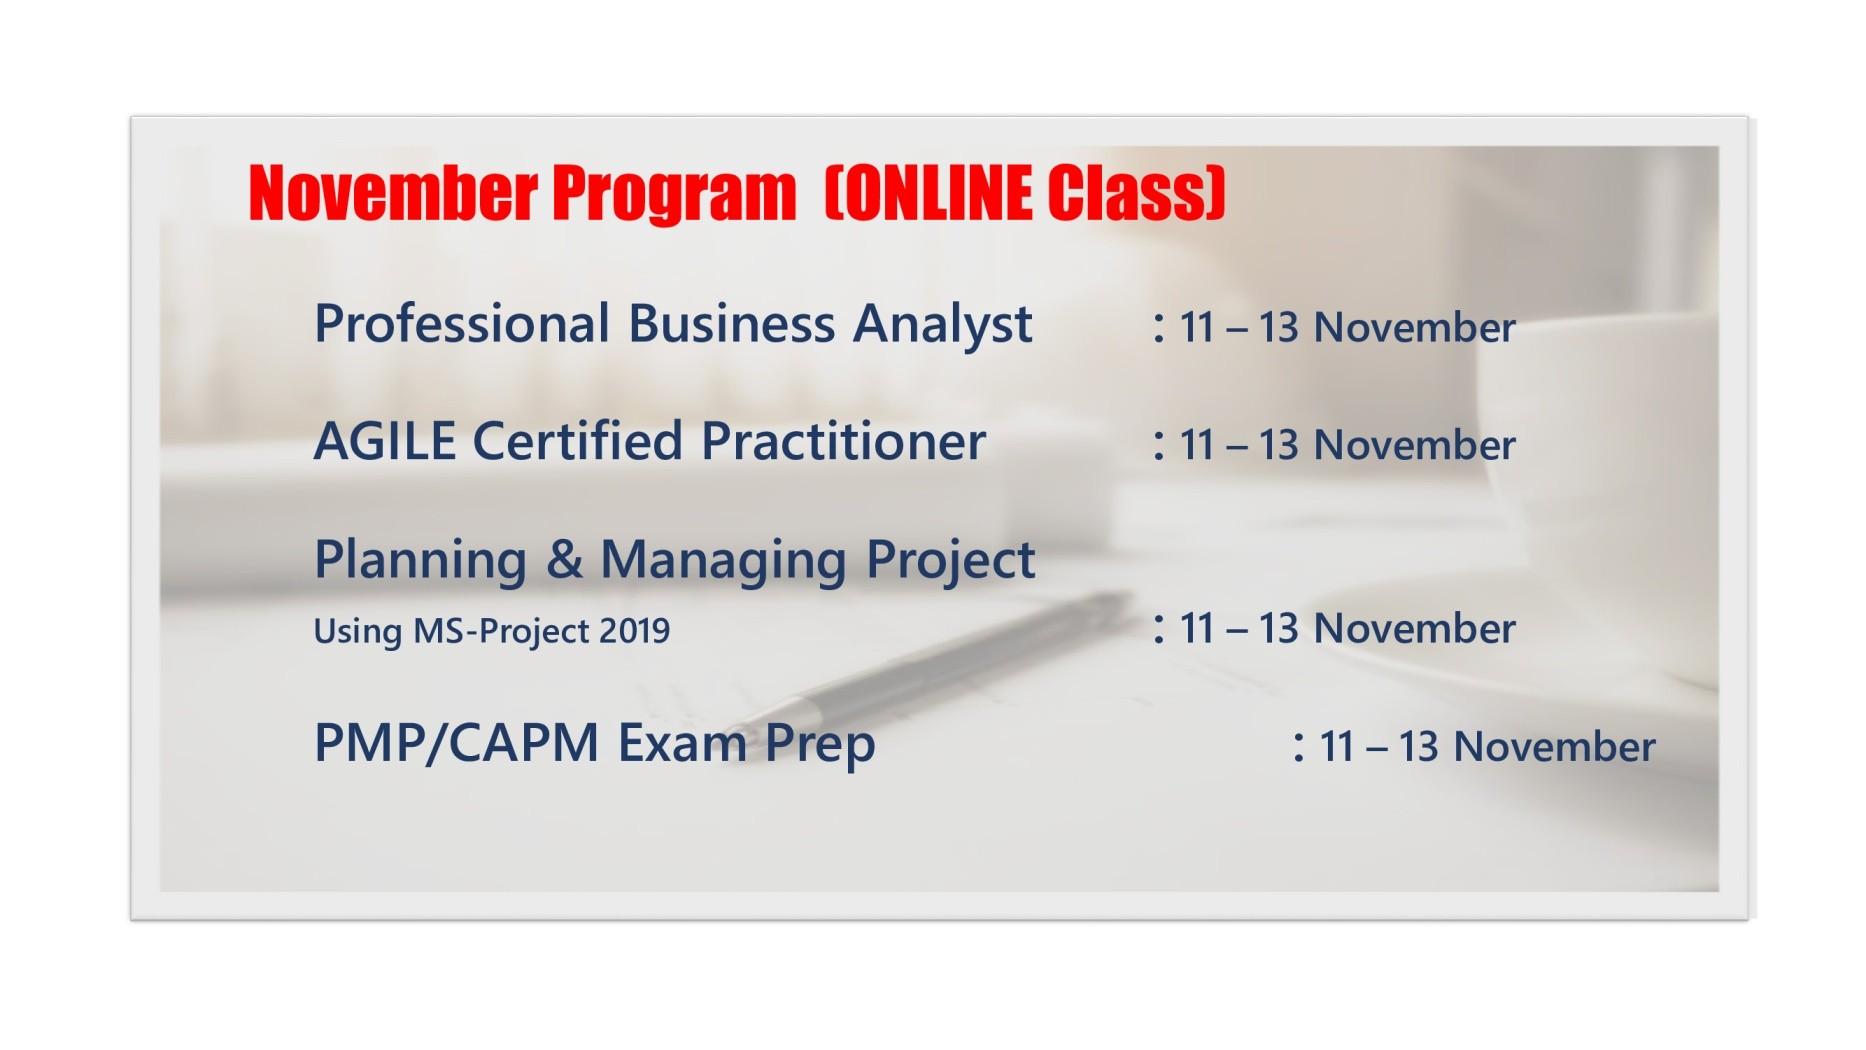 November Program